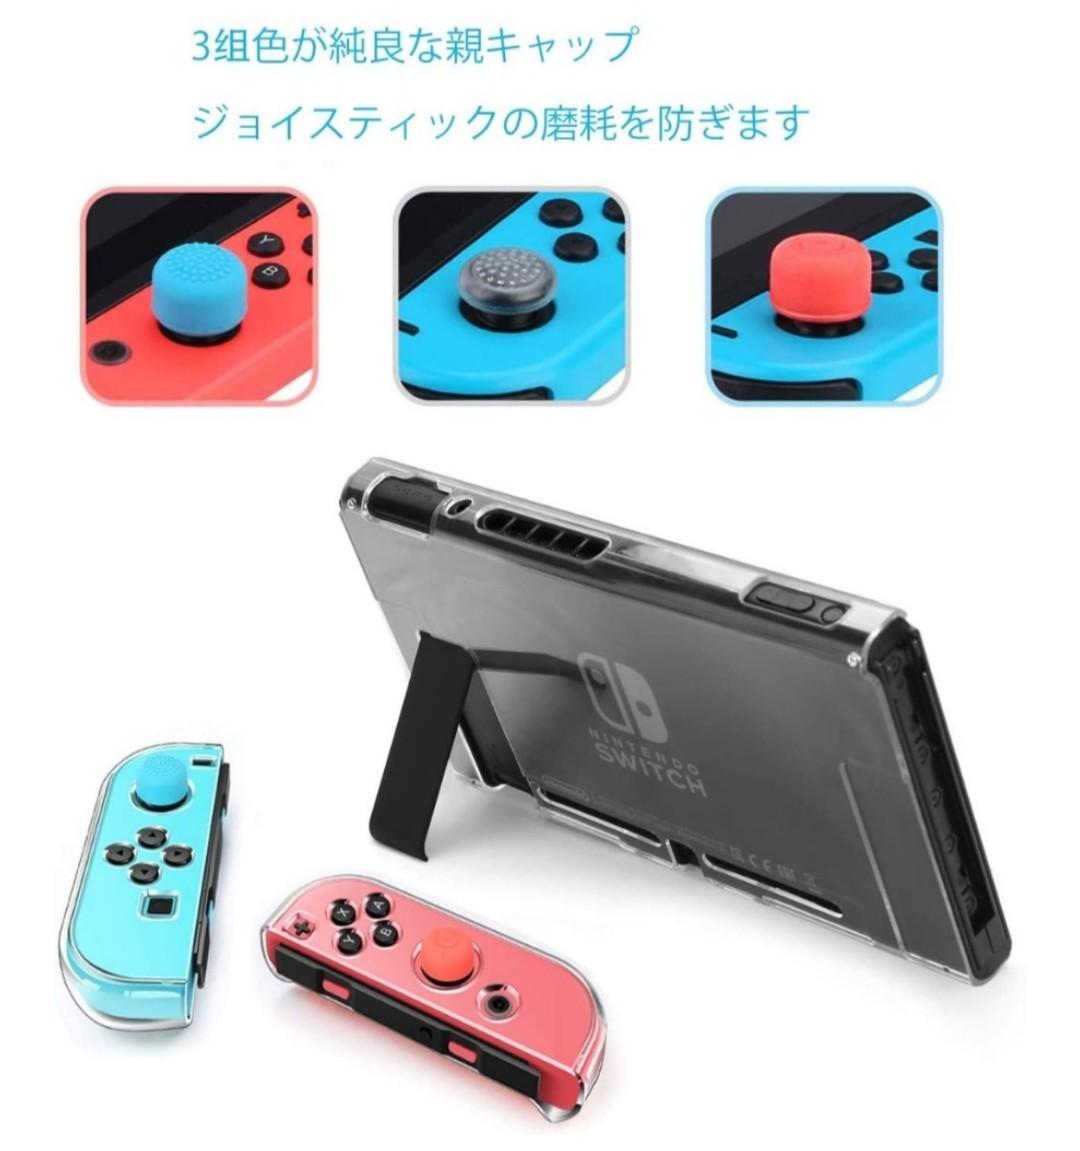 Nintendo Switch ニンテンドースイッチ 収納ケース